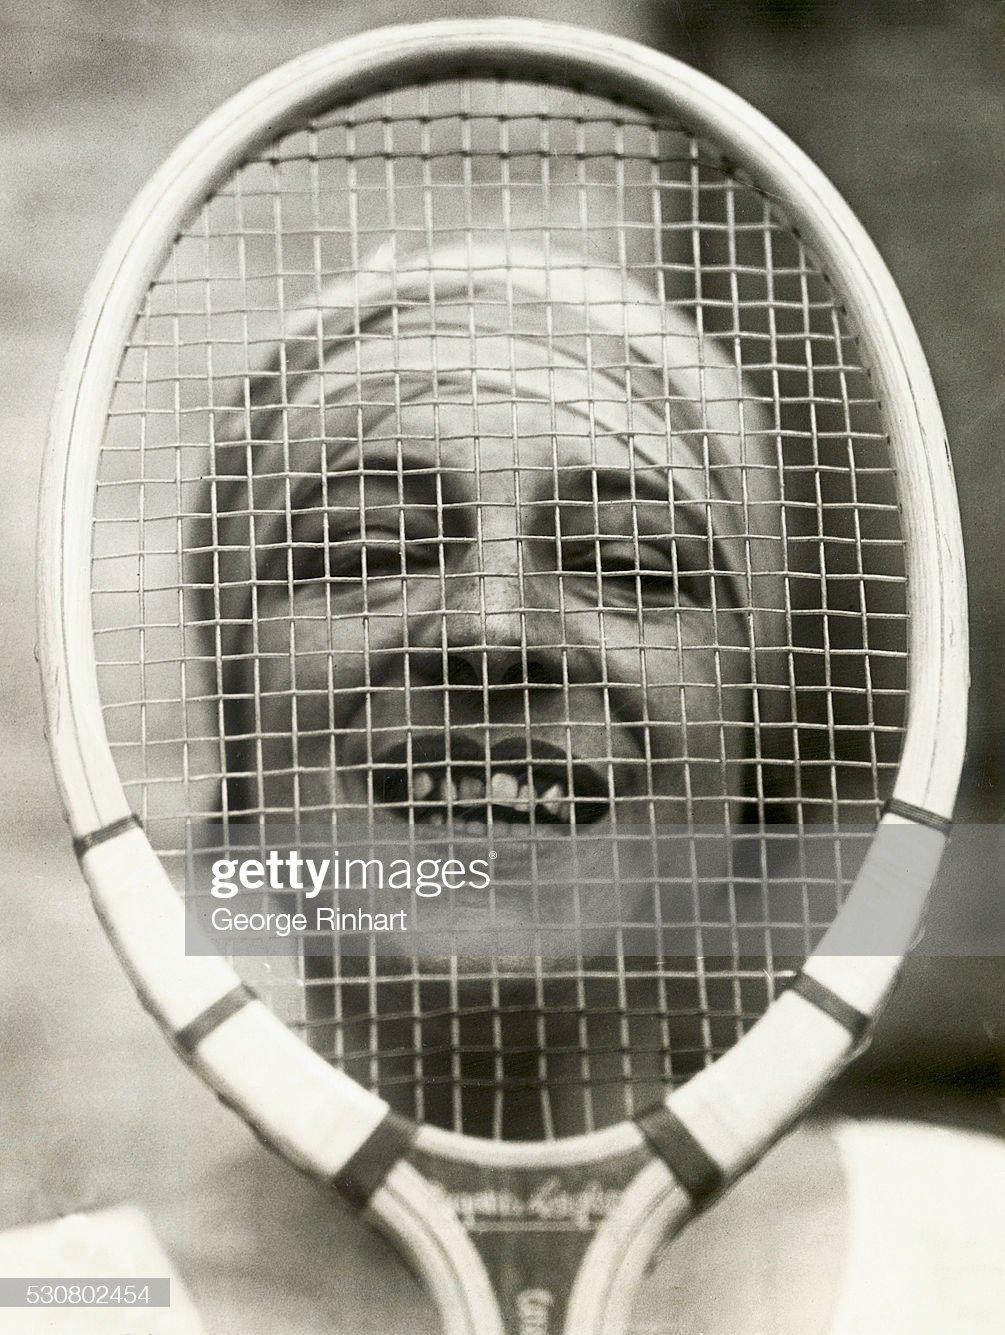 Suzanne Lenglen Looking Through Her Racquet : News Photo